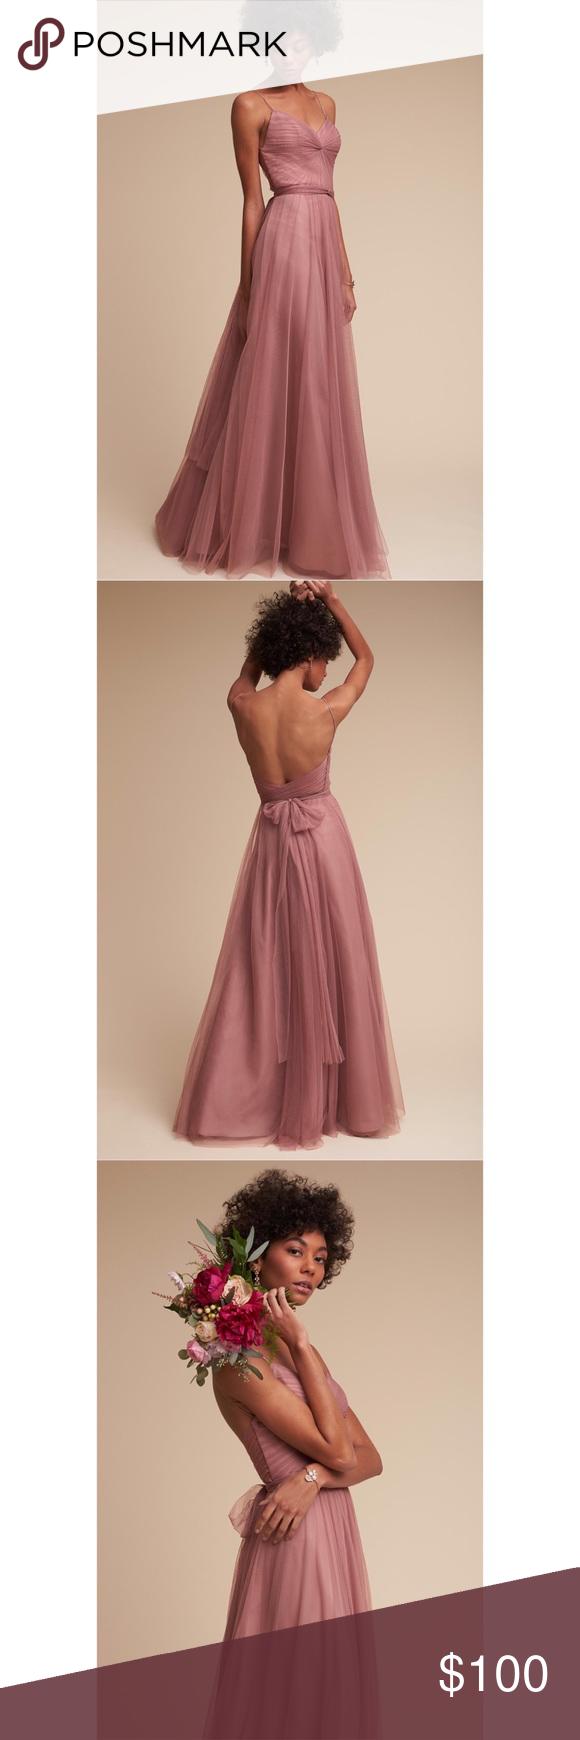 284a9226eca91 NEW w/ FLAW Anthropologie BHLDN Tinsley Dress New with flaw Anthropologie  BHLDN Tinsley bridesmaids dress